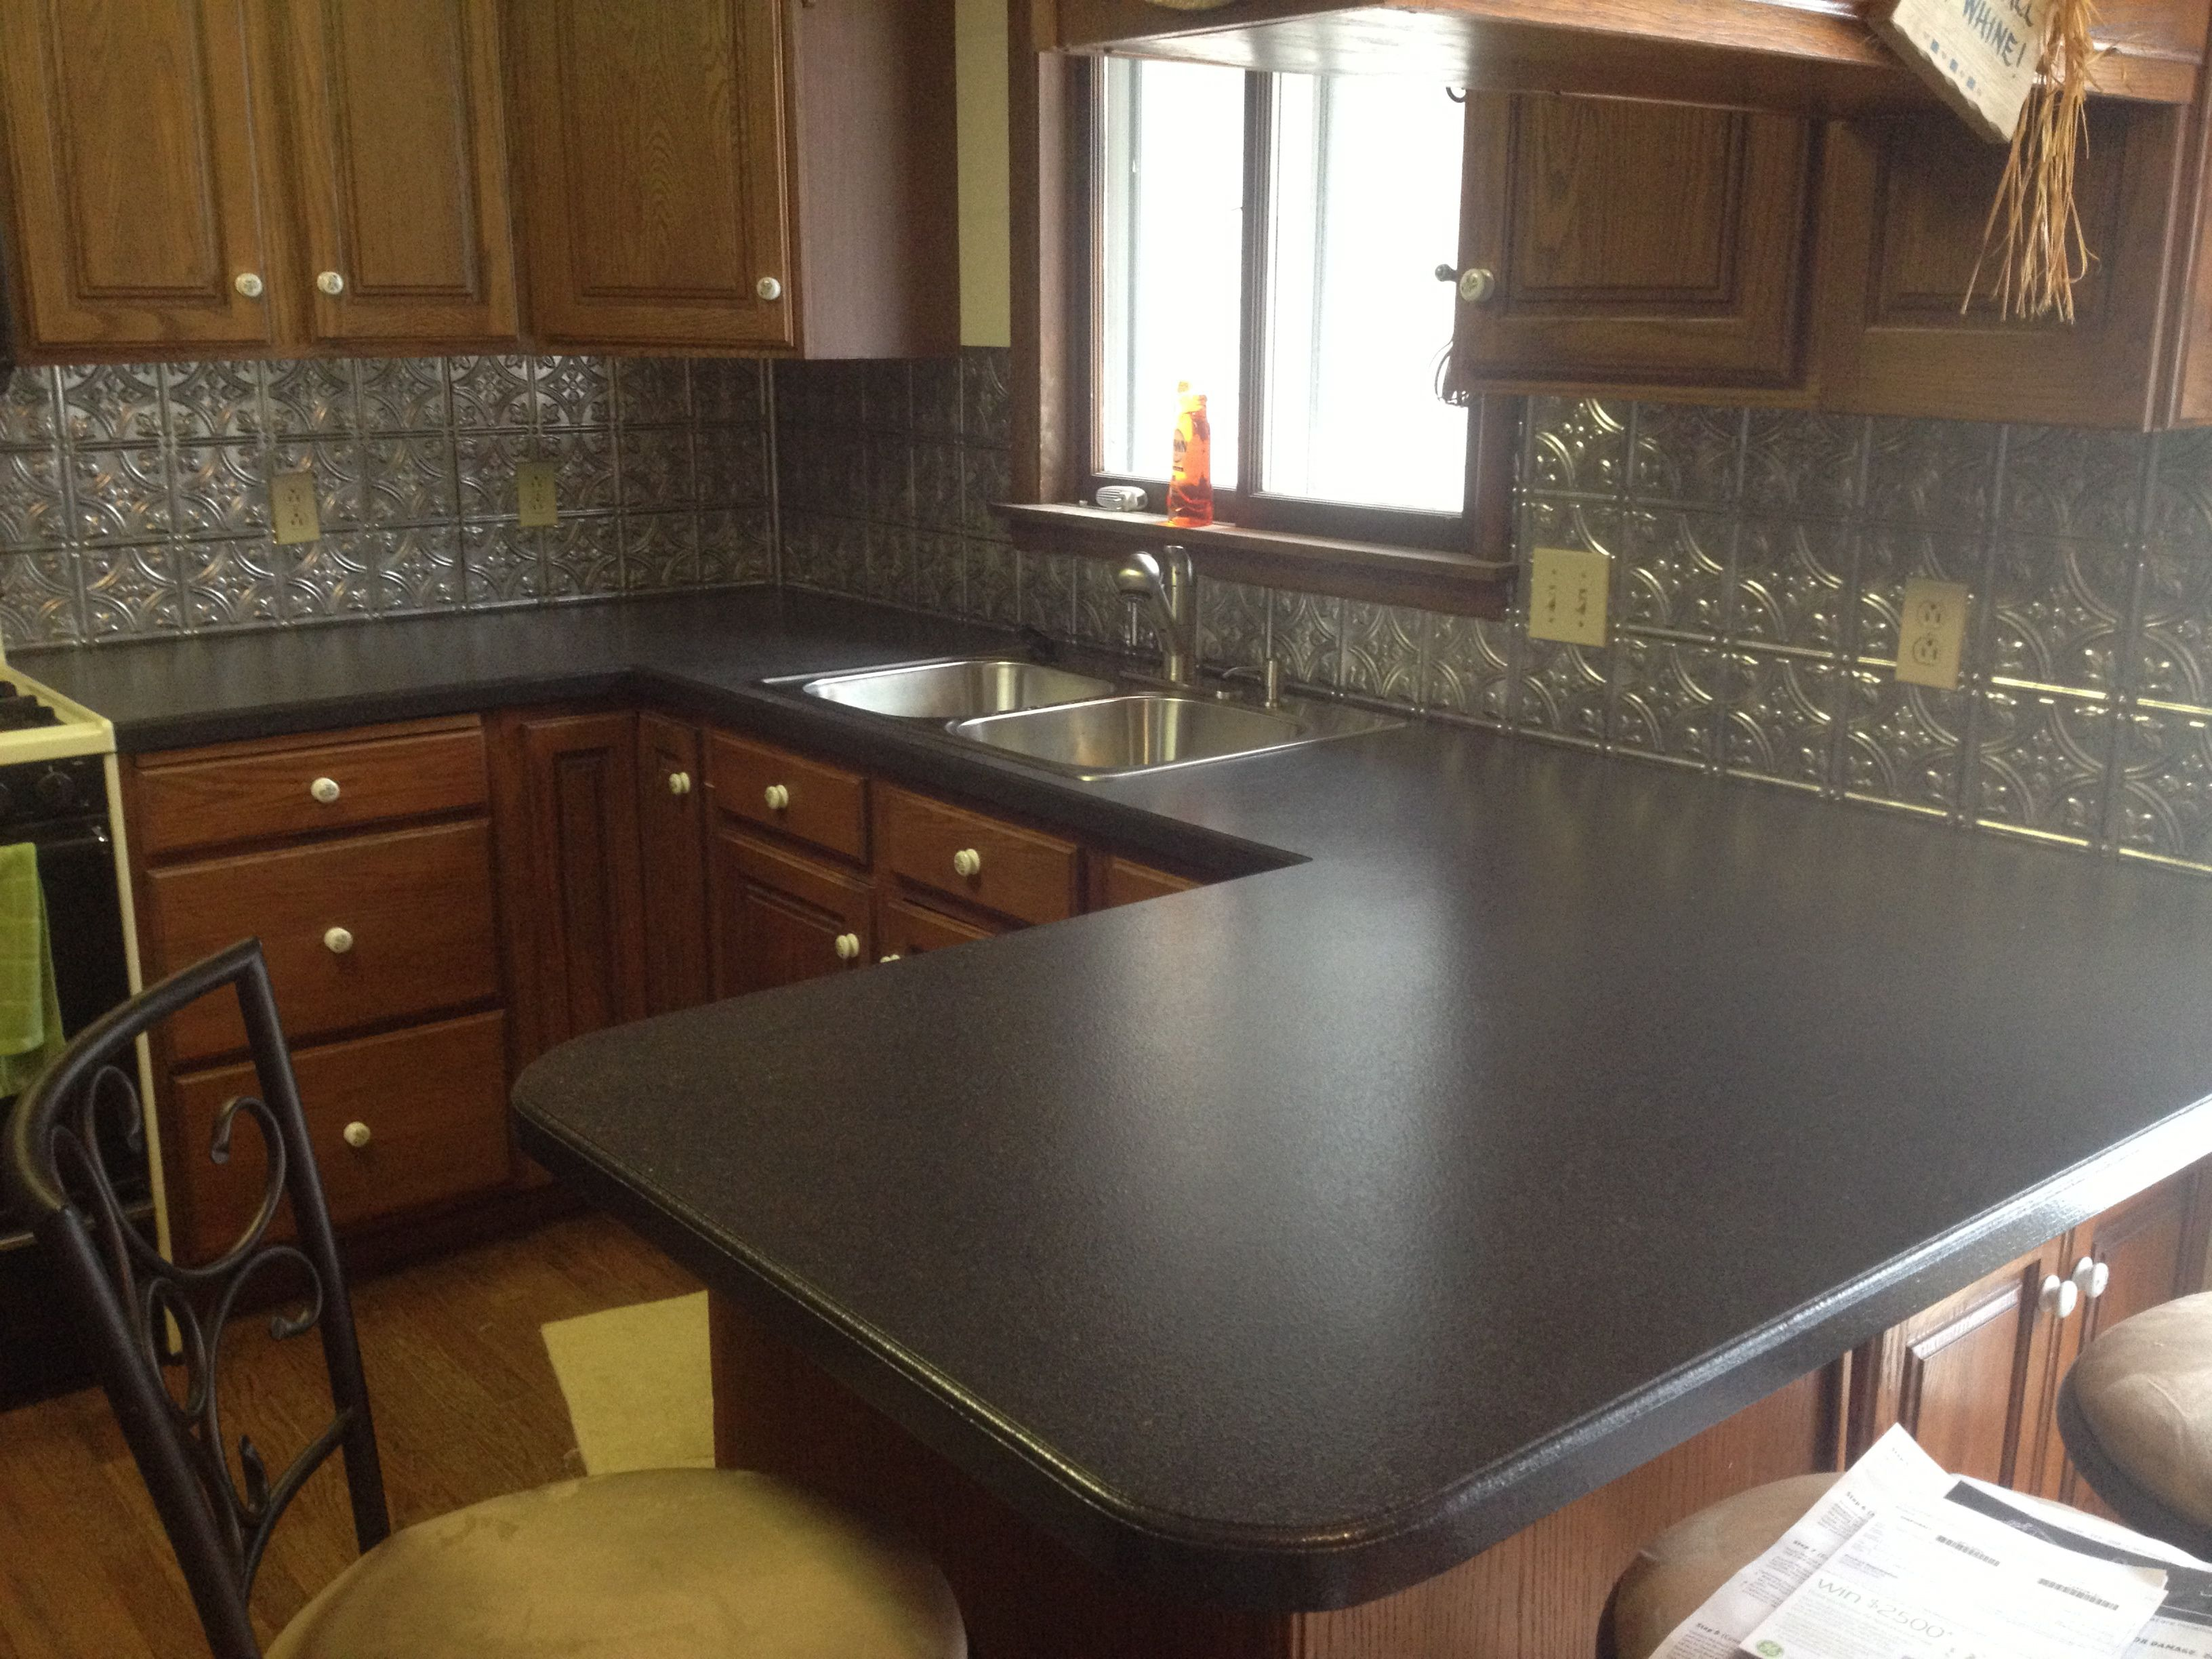 corian kitchen countertops pantry cabinet lowes black vs granite countertop with tile backsplash